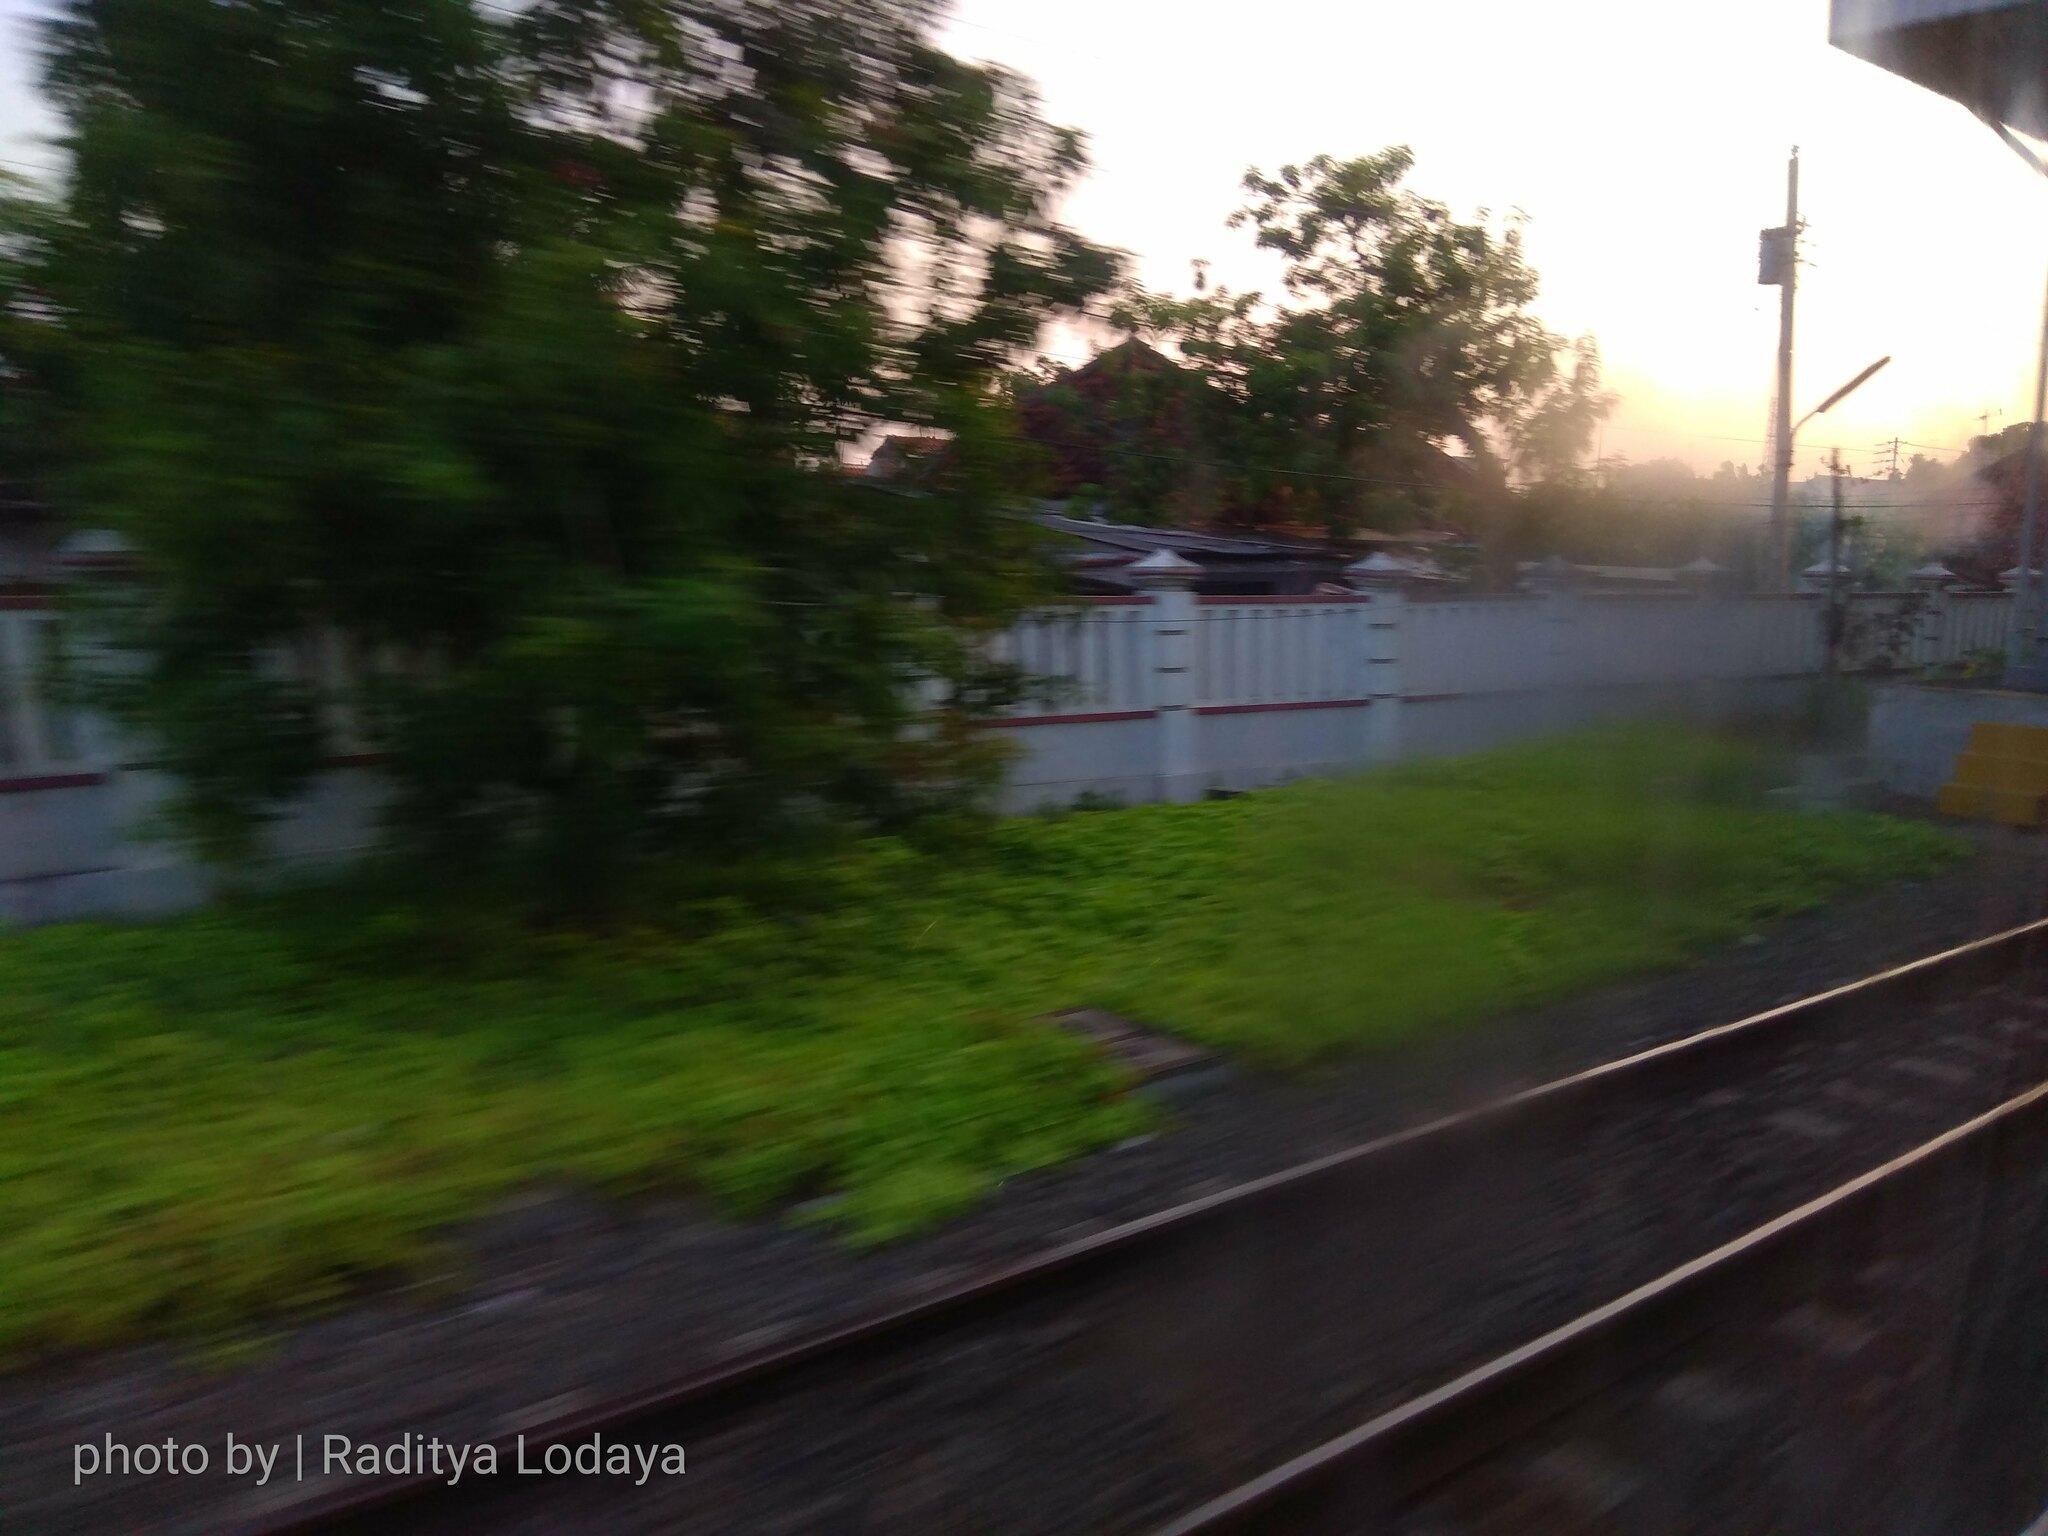 06 TRIP REPORT KERETA API JAYABAYA 2 (CIREBON TEGAL) - STASIUN BREBES 3